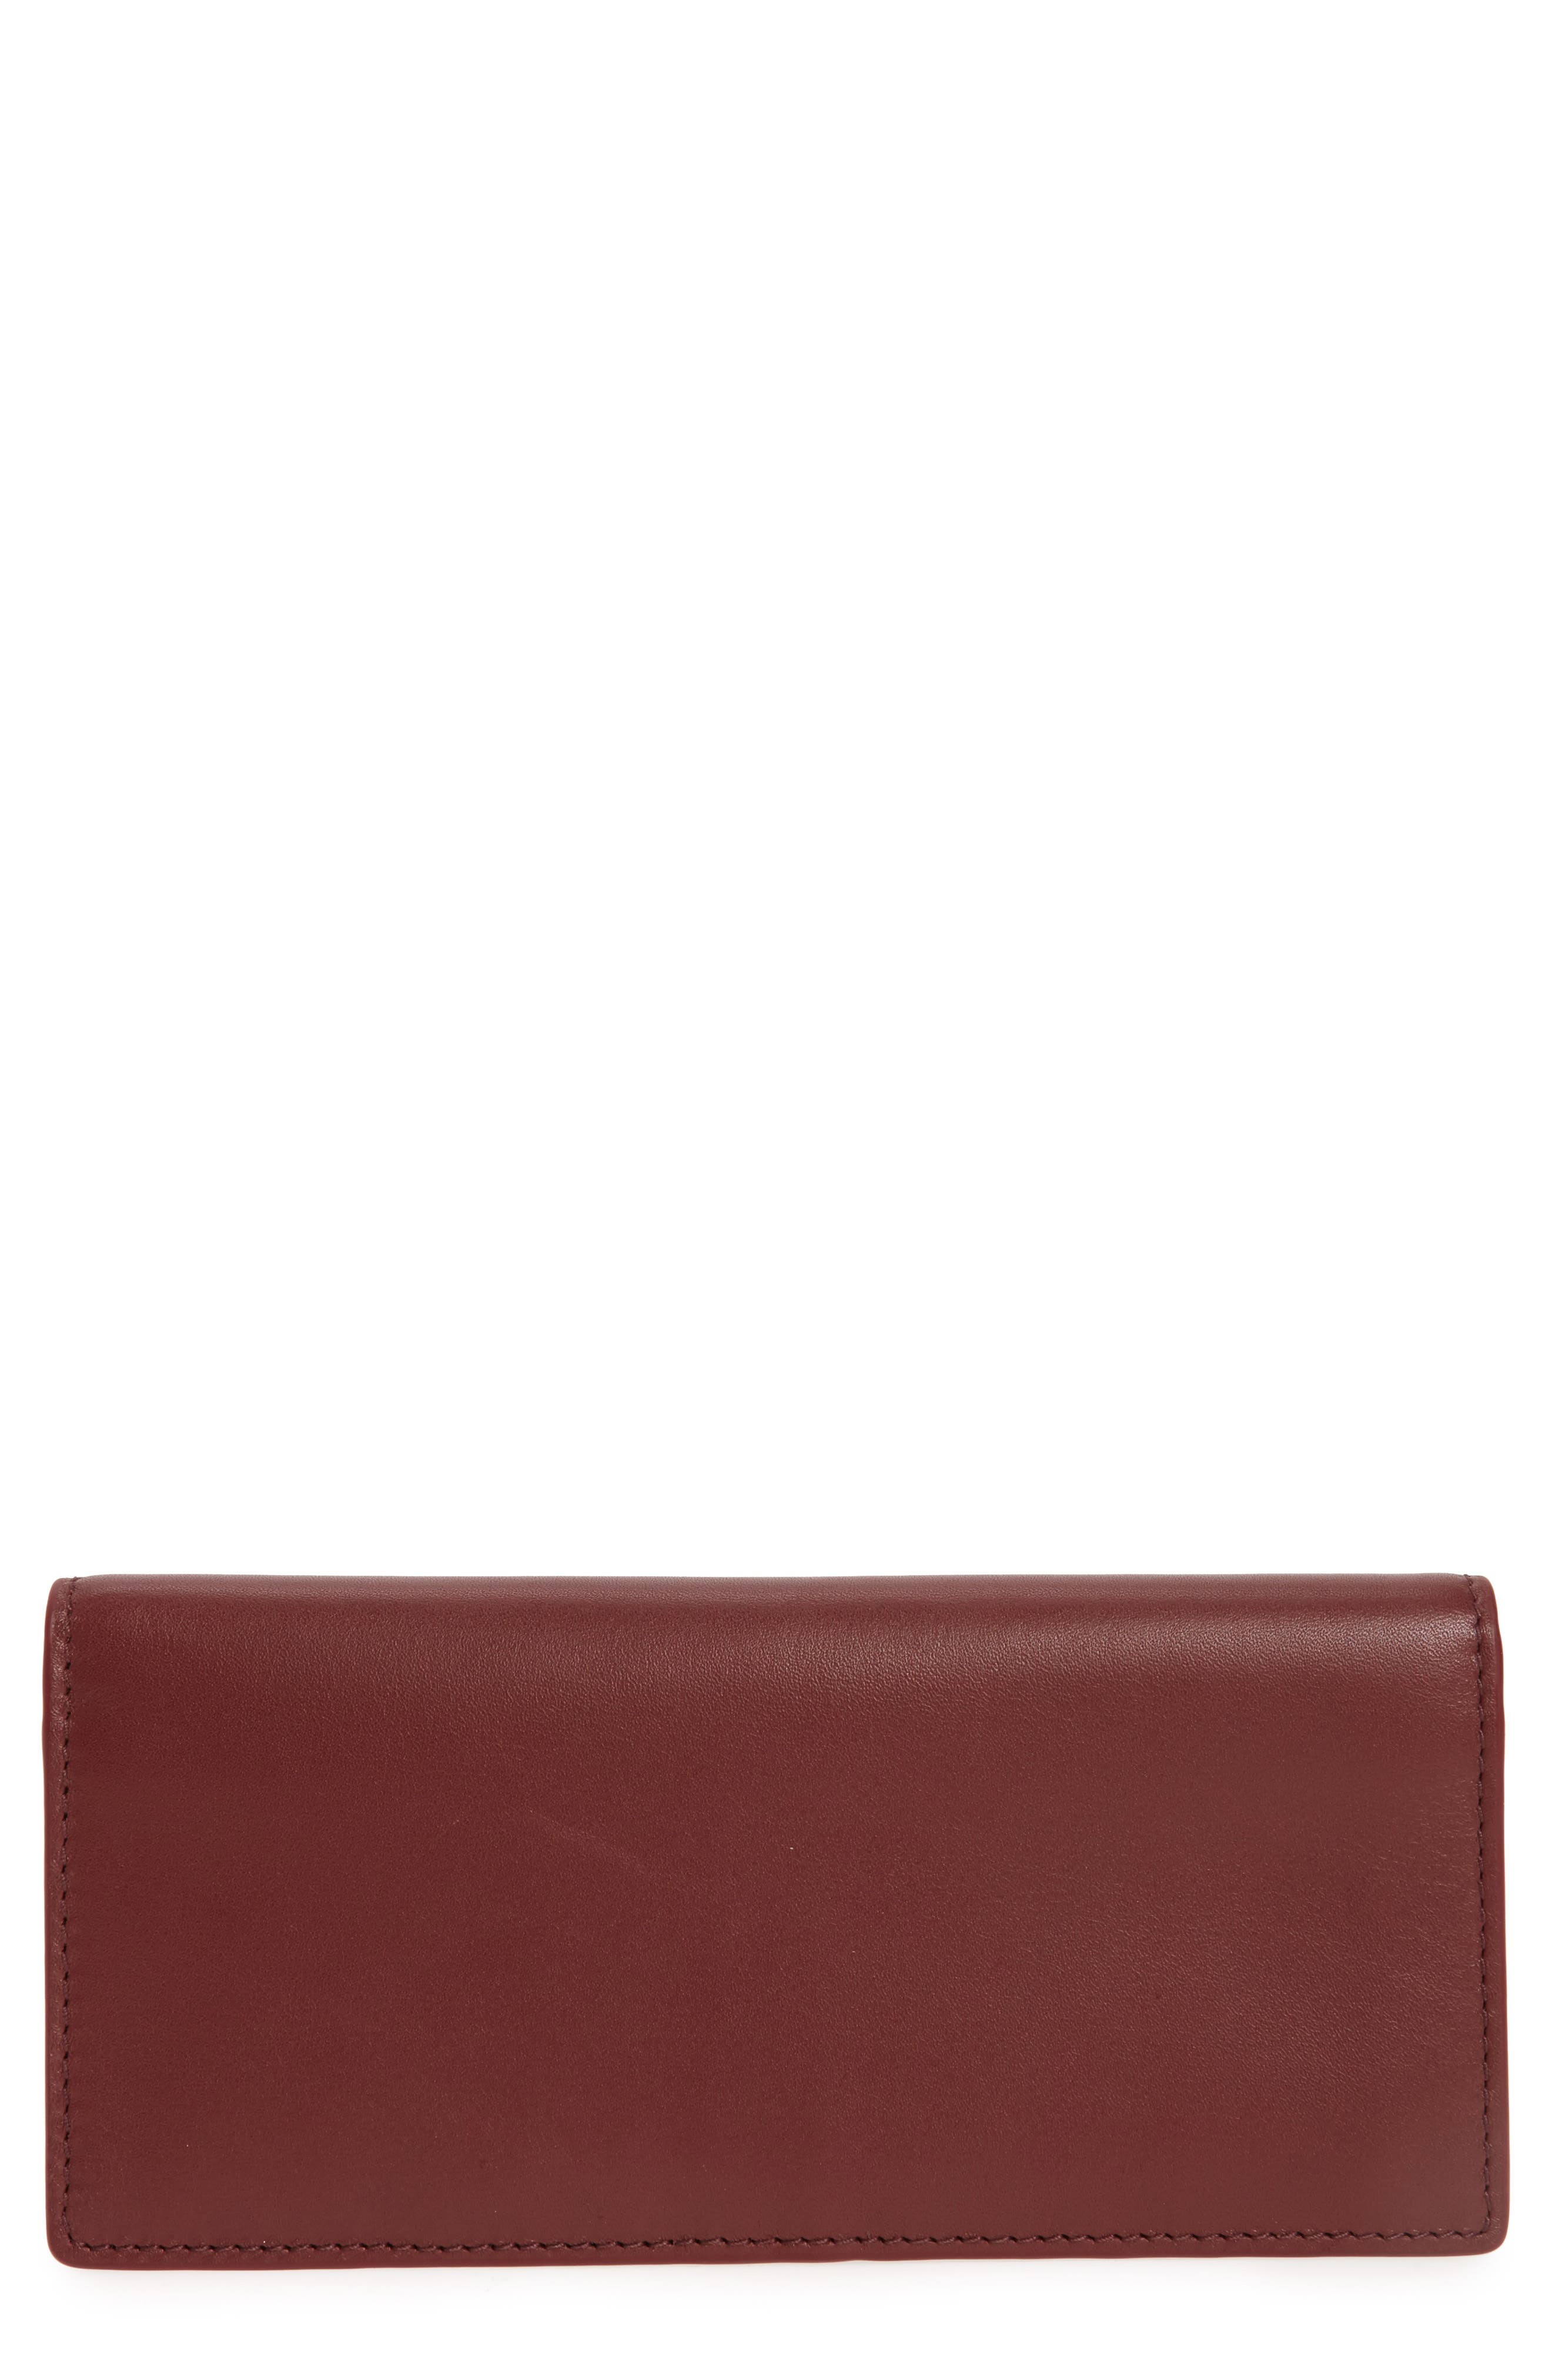 Skagen Slim Vertical Leather Wallet